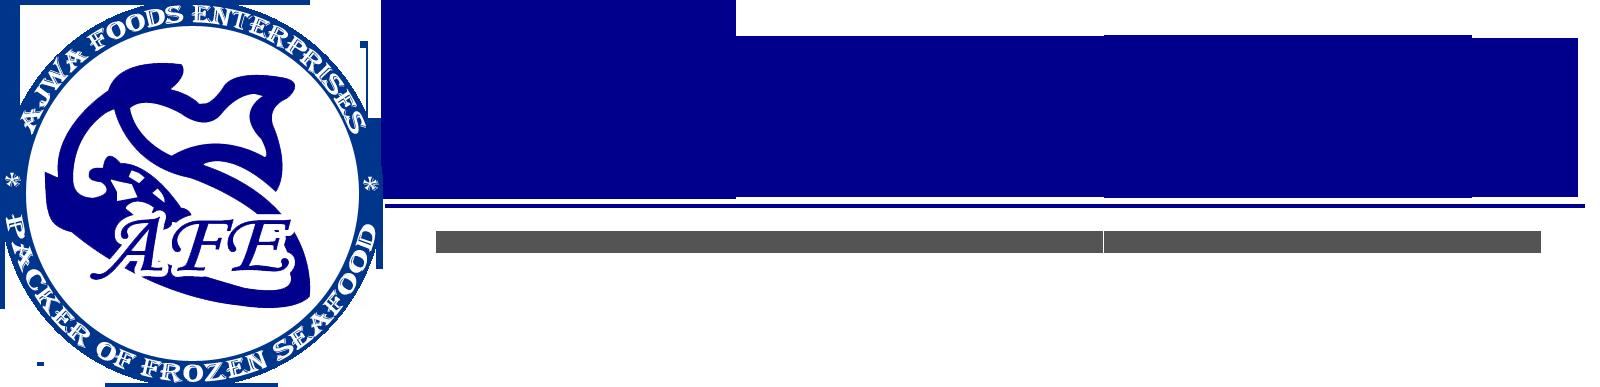 Ajwa Foods logo